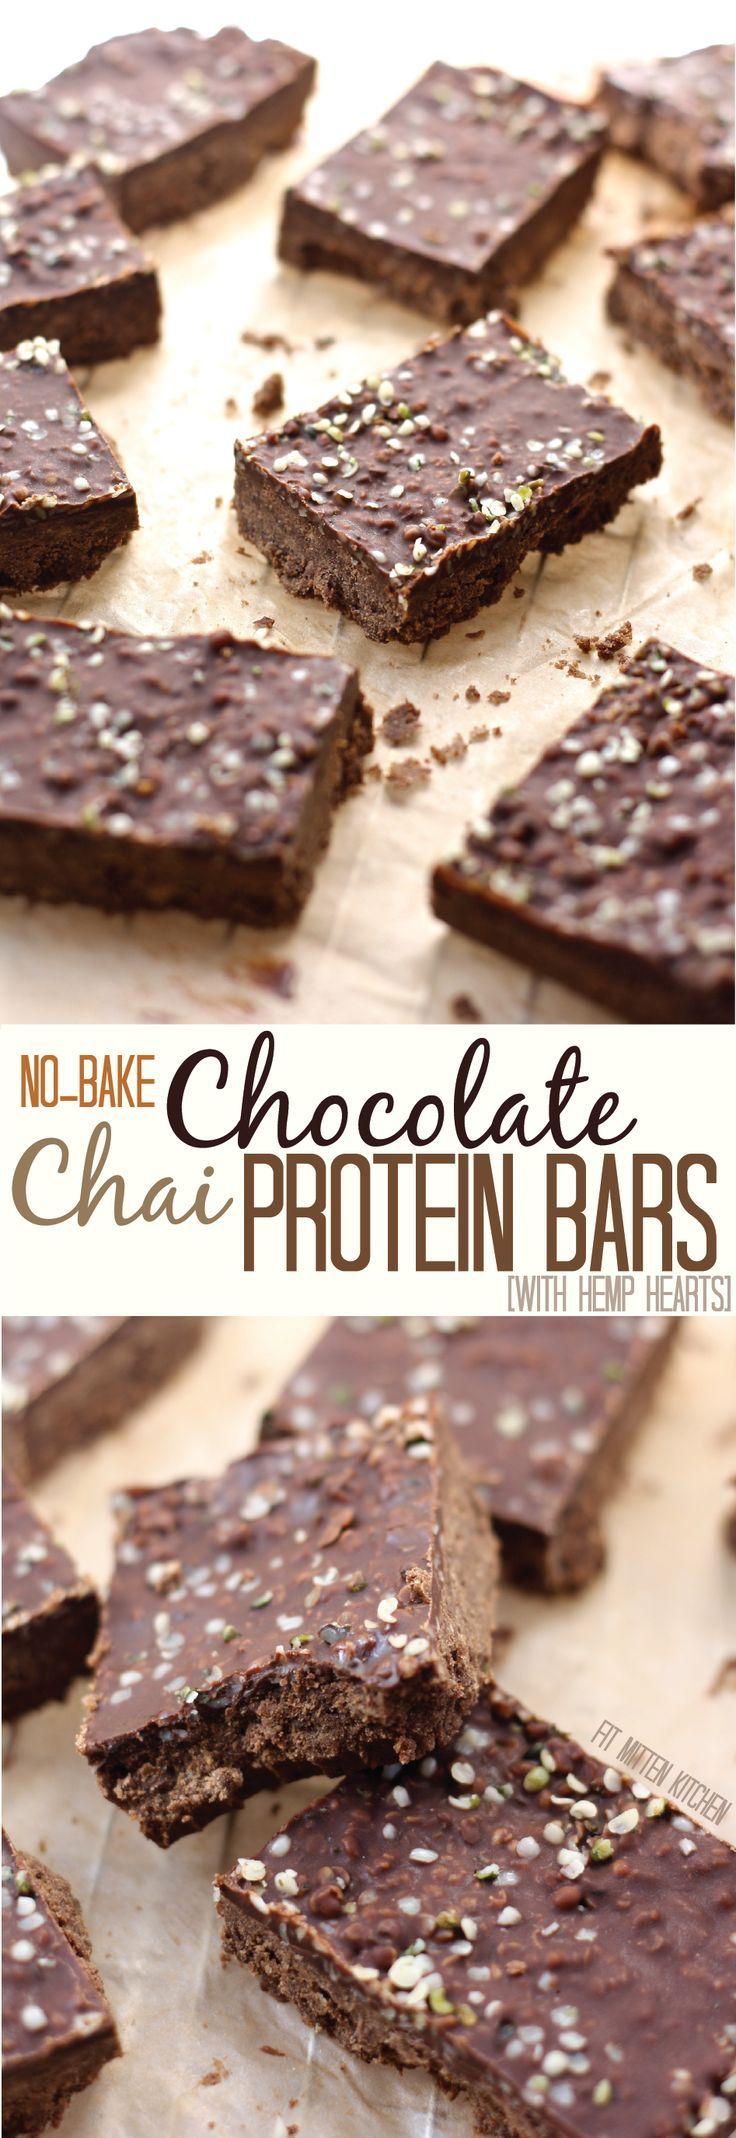 We're celebrating some hemp heart love with these Chocolate Chai Protein Bars. Chocolate-y, chai-like, vegan-friendly, no-bake goodness. #vegan #dairyfree #protein #plantprotein #hemphearts